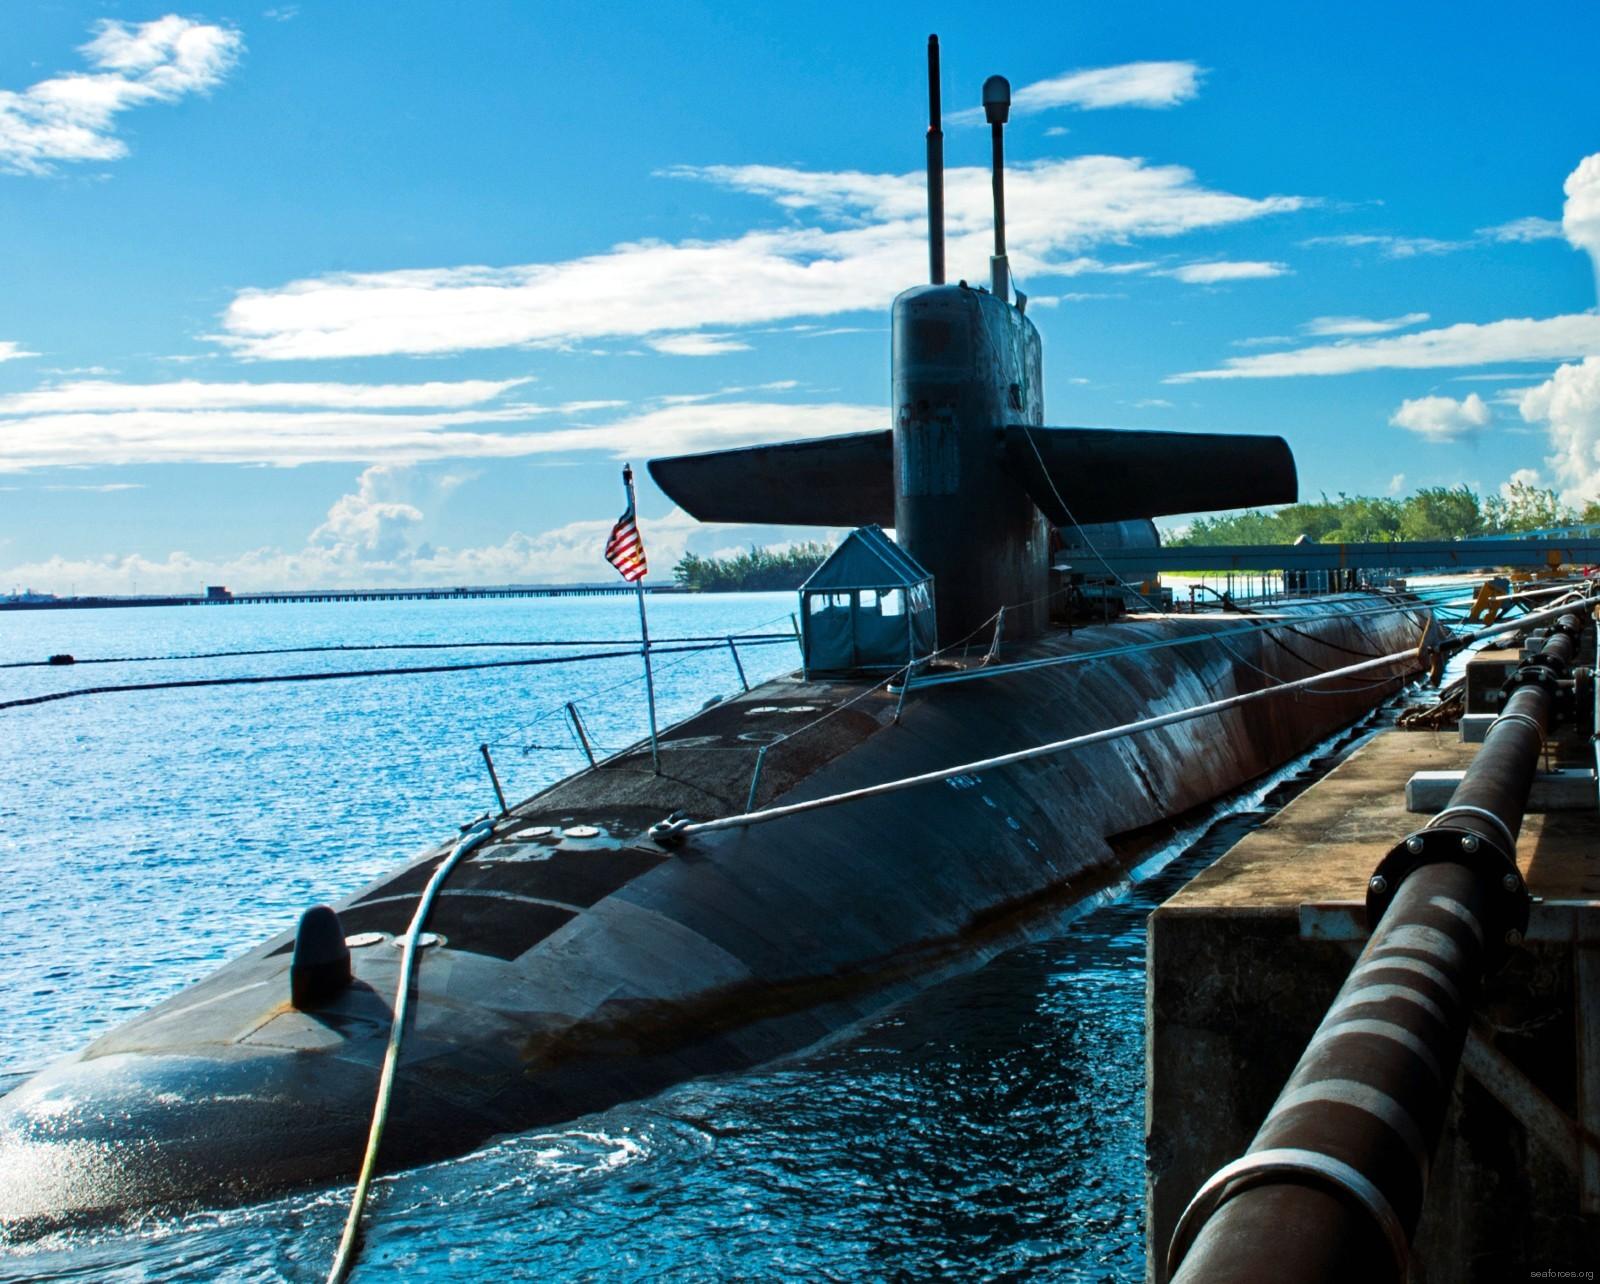 A US submarine at the Diego Garcia base